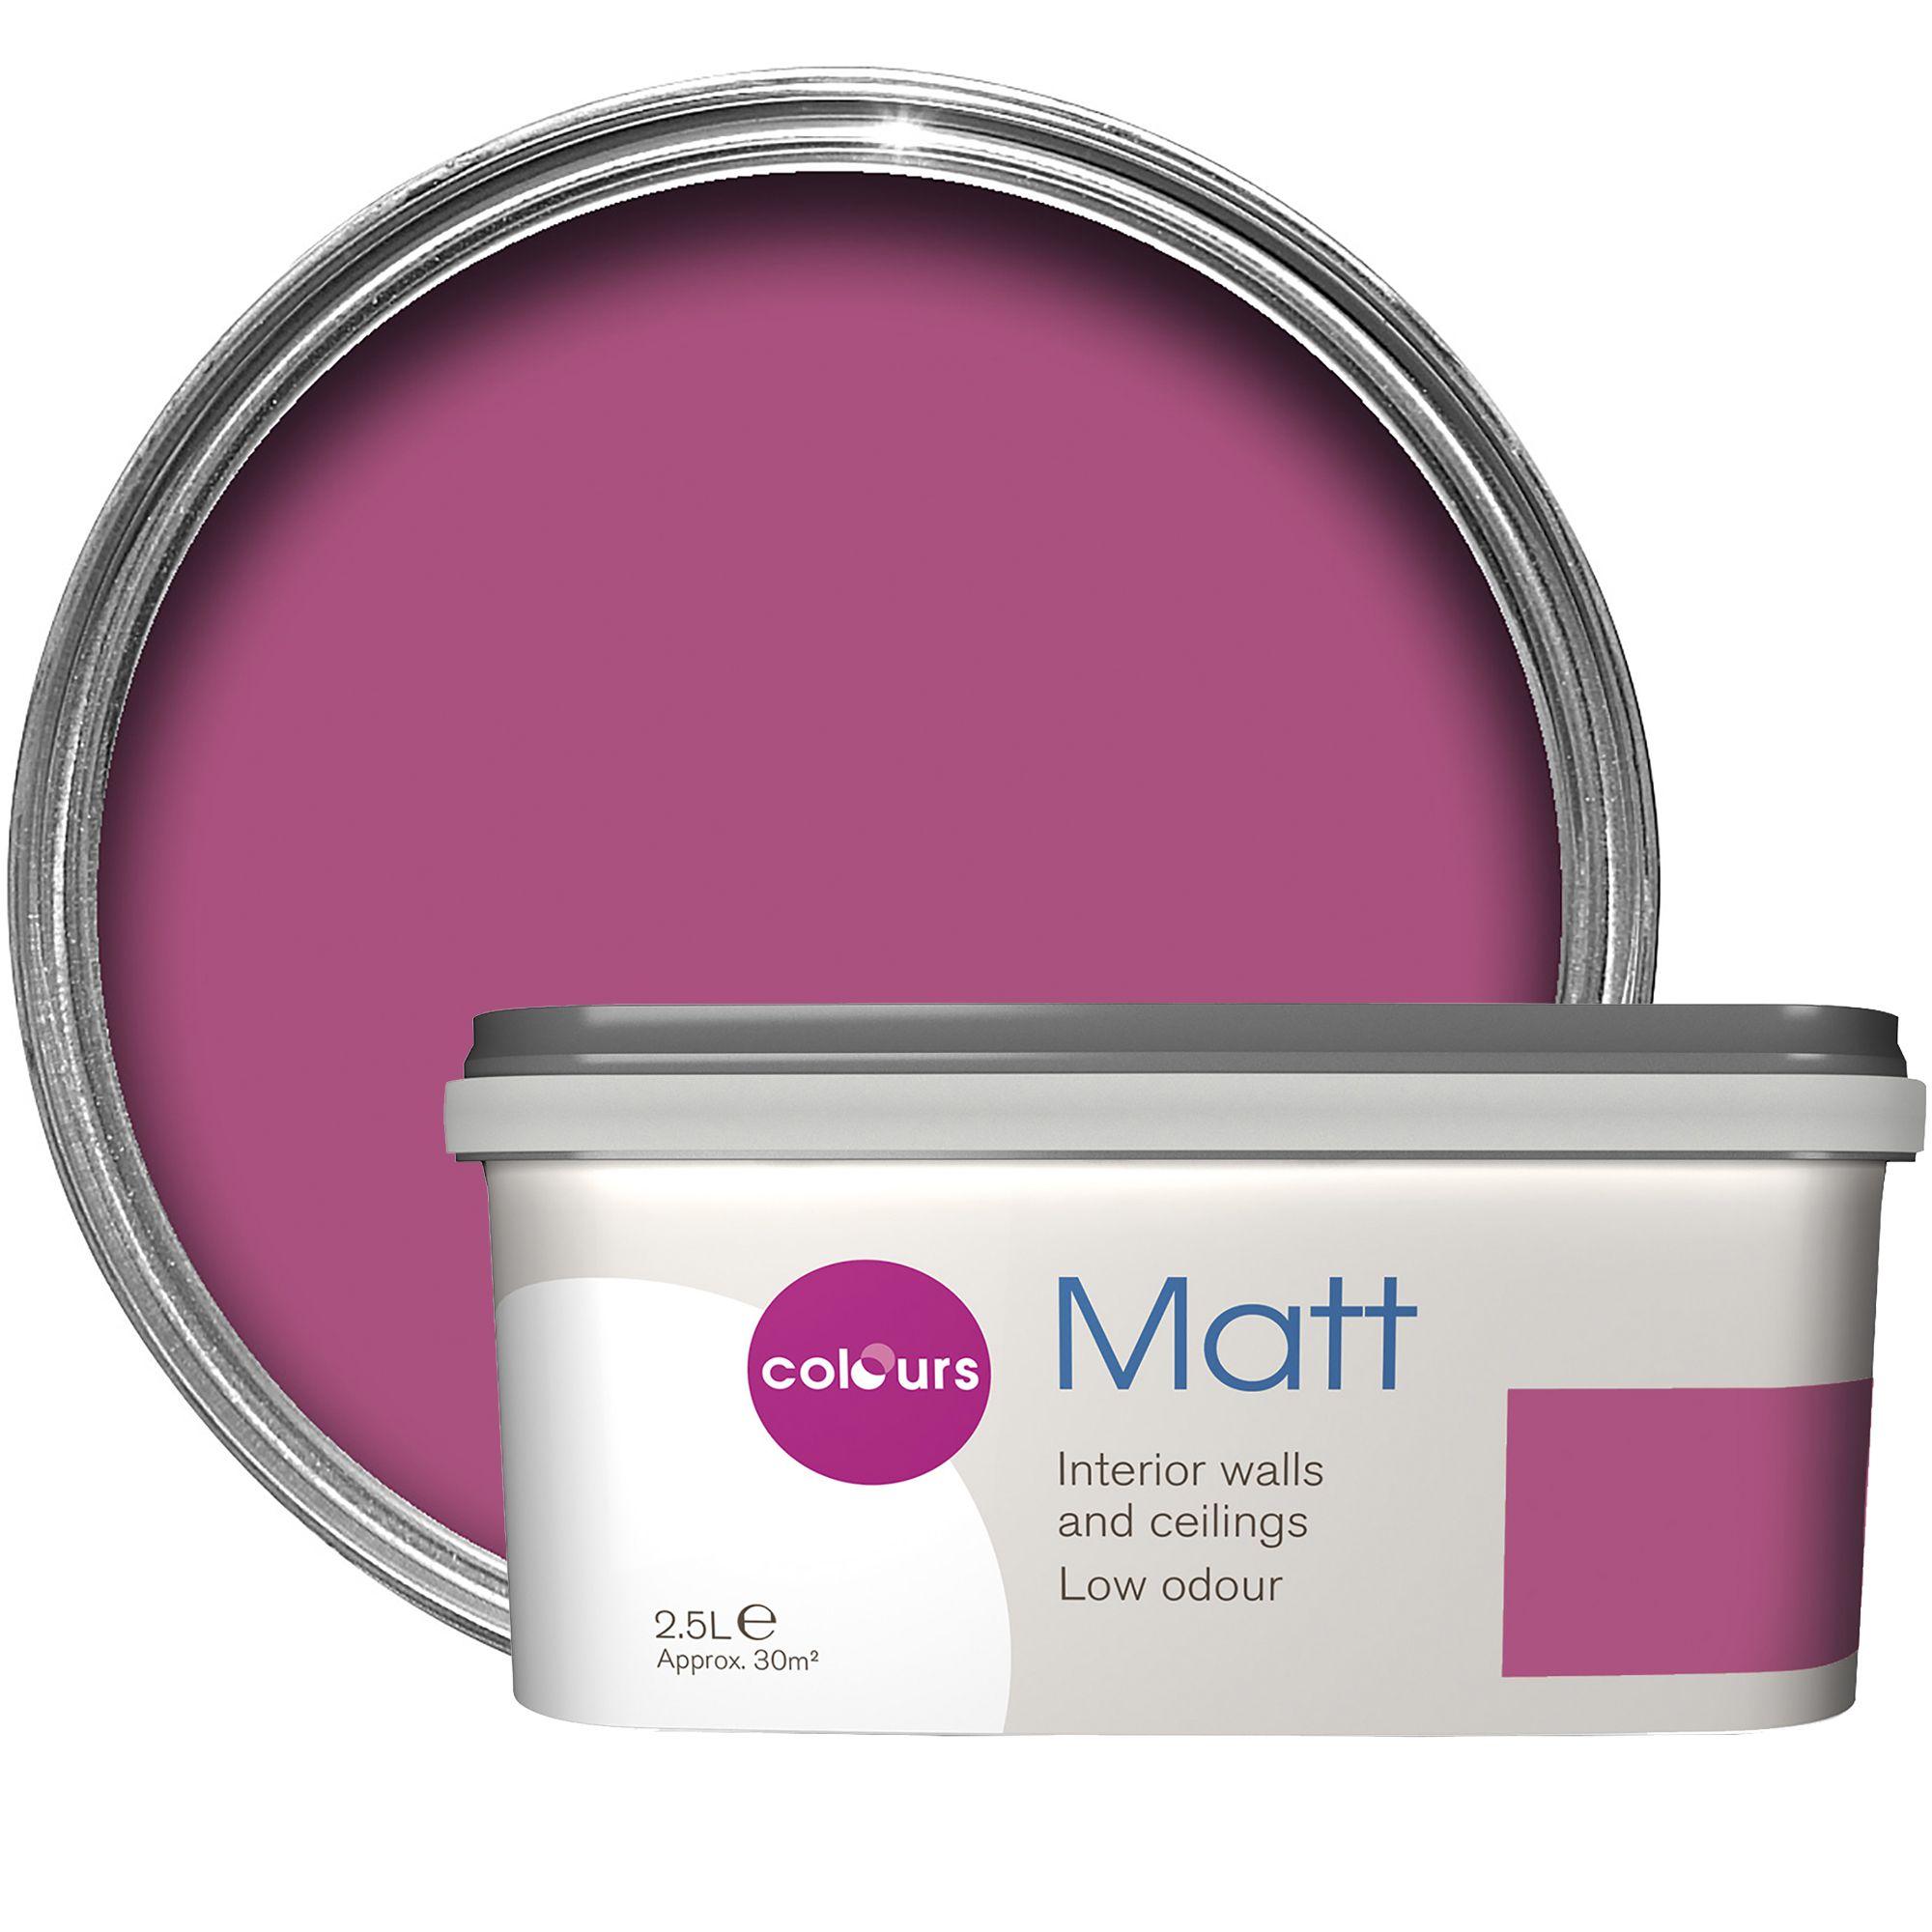 Colours standard playful pink matt emulsion paint 2 5l departments diy at b q - Matt exterior paint image ...